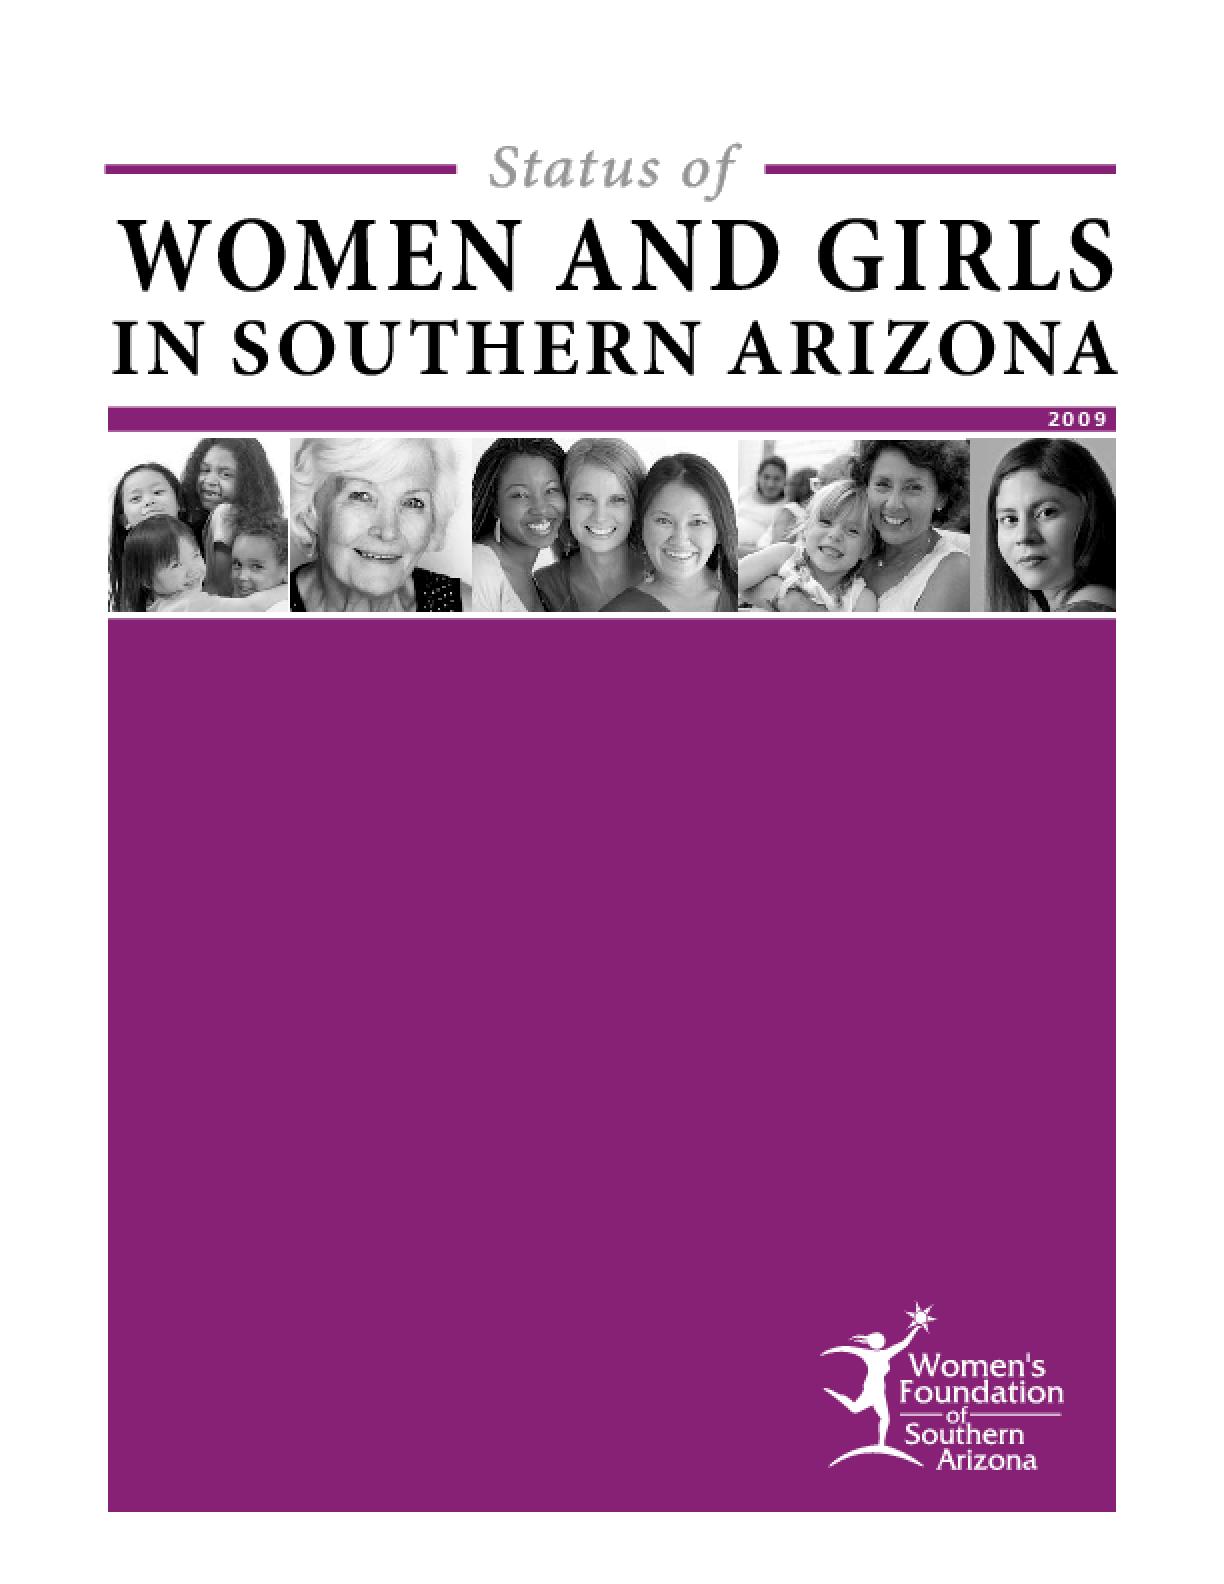 Status of Women and Girls in Southern Arizona 2009